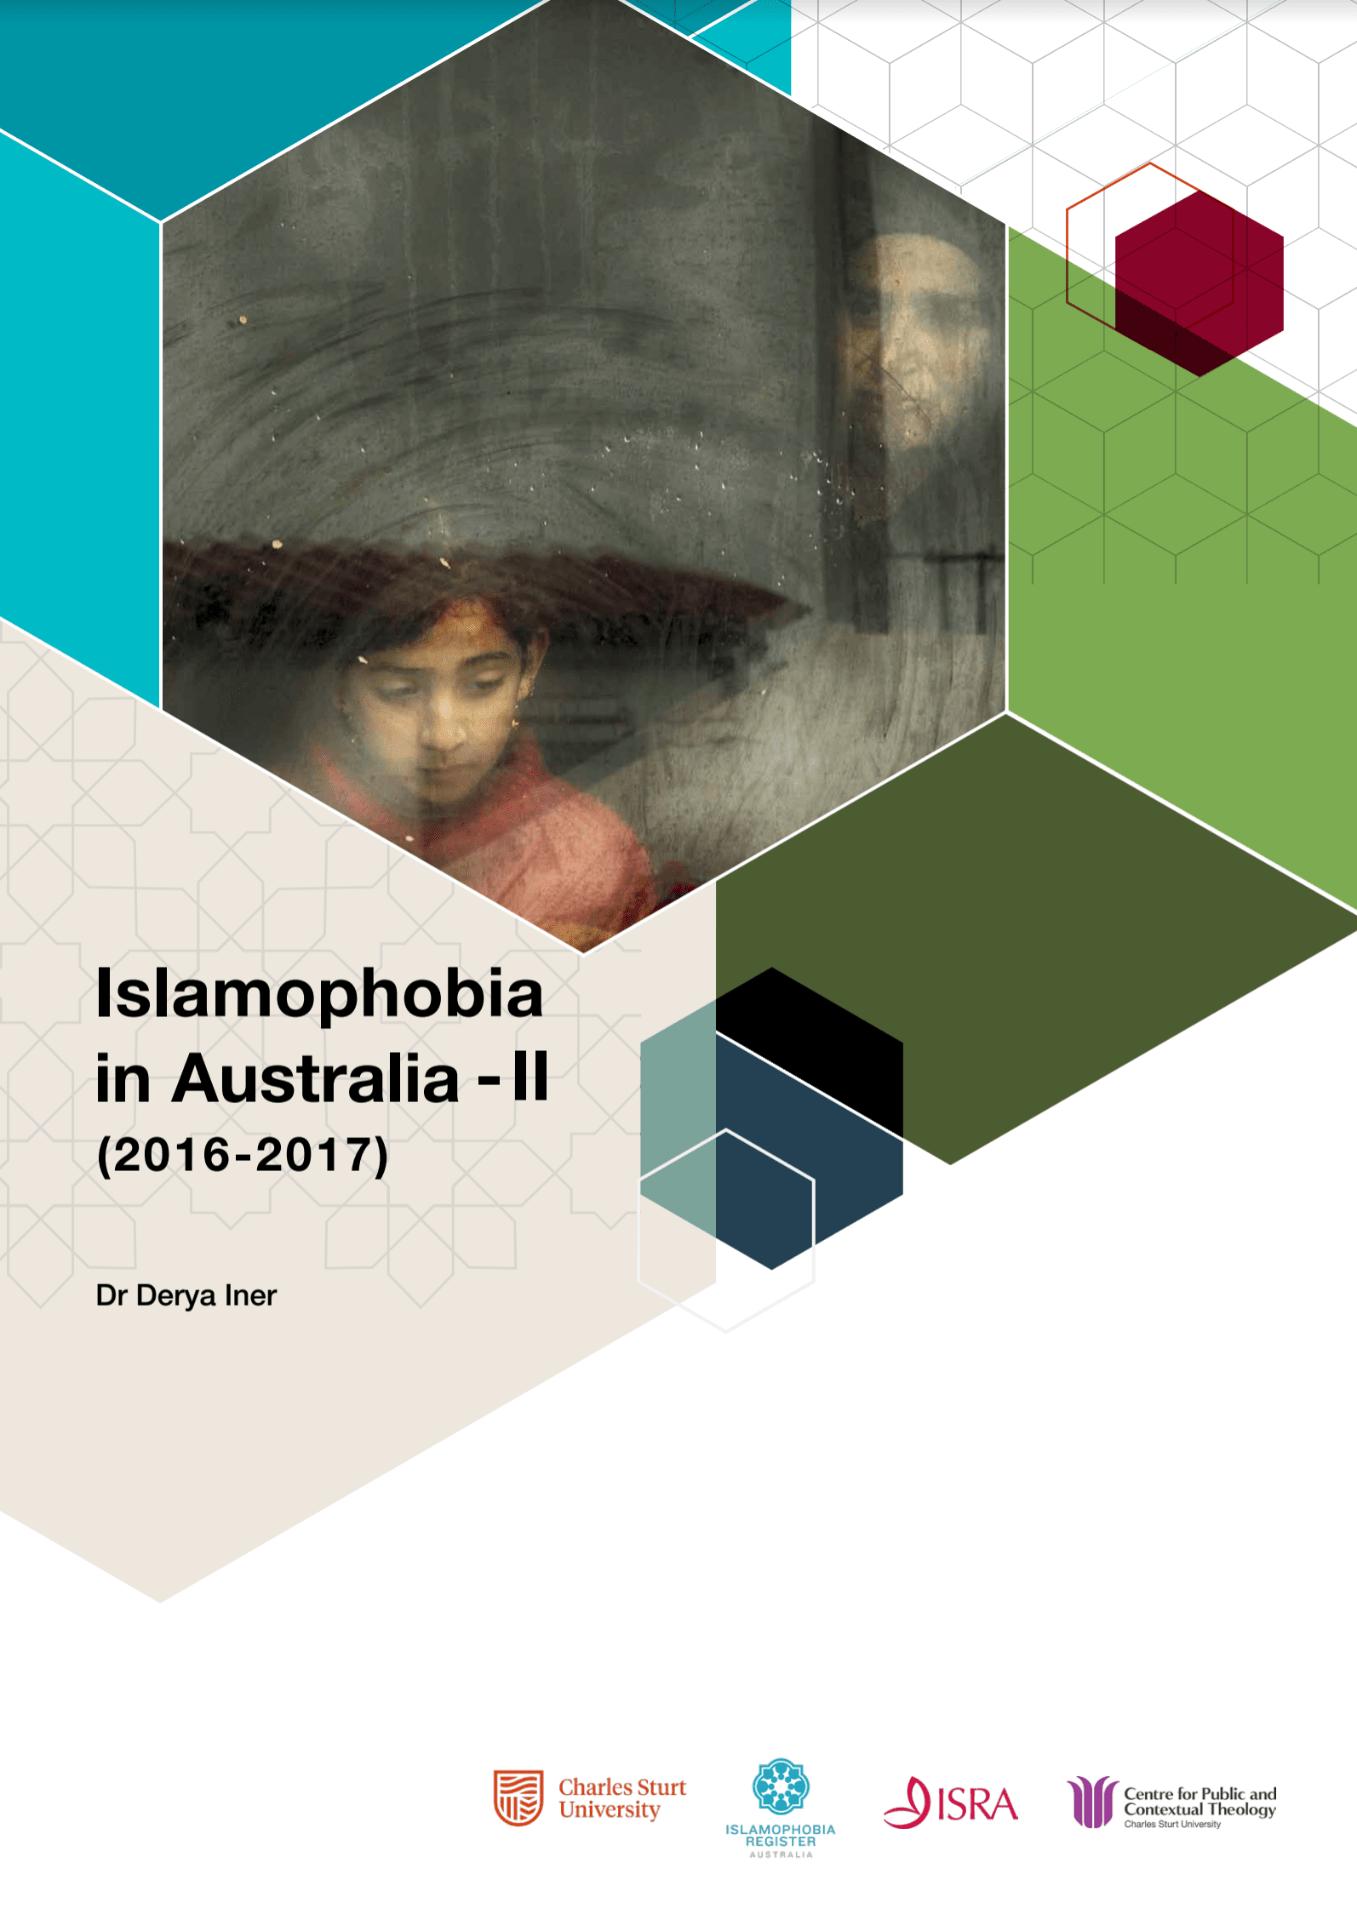 Islamophobia in Australia Report II